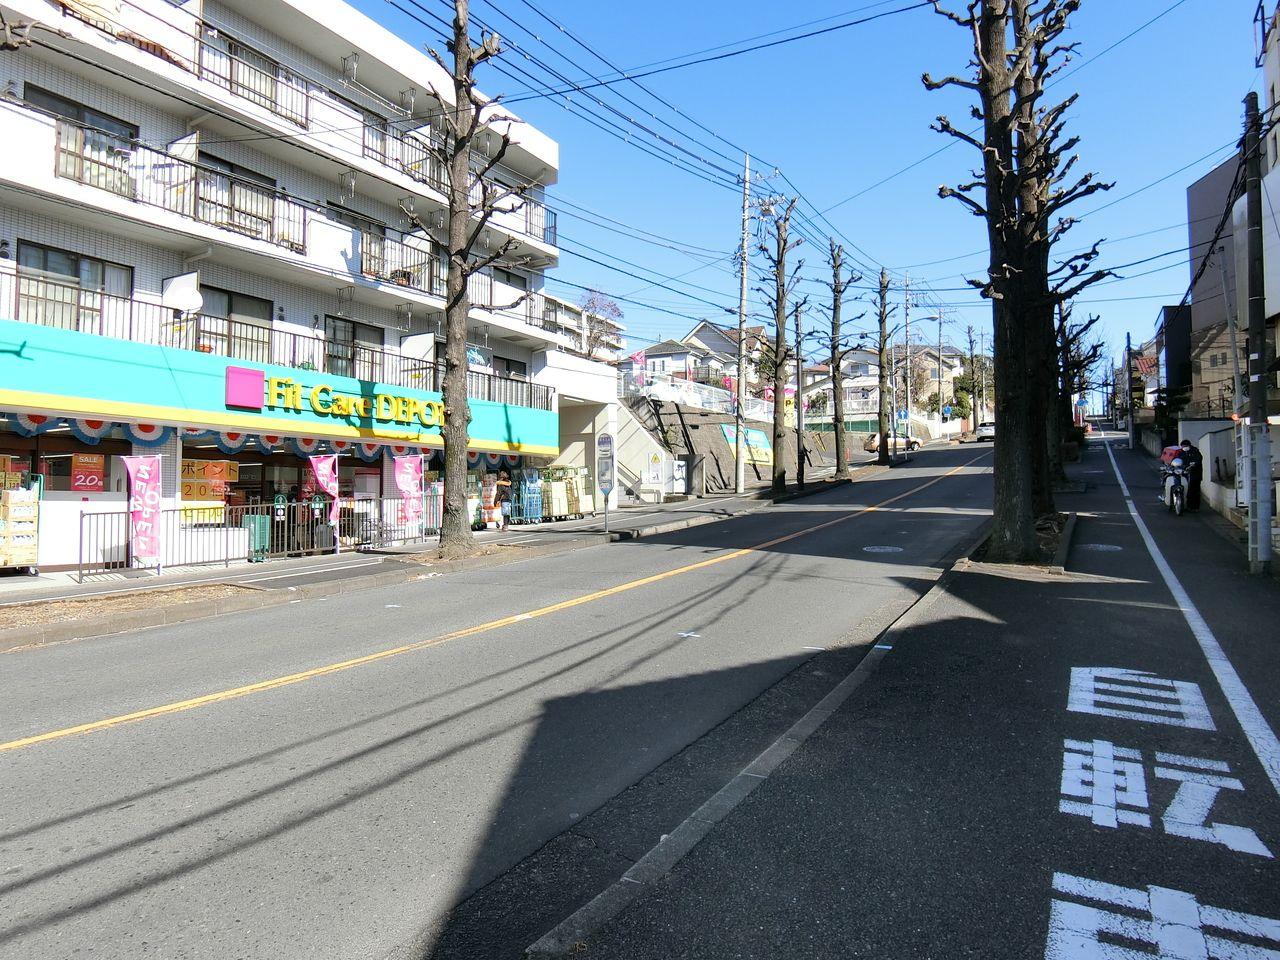 Fit Care DEPOT 元石川店の駐車場